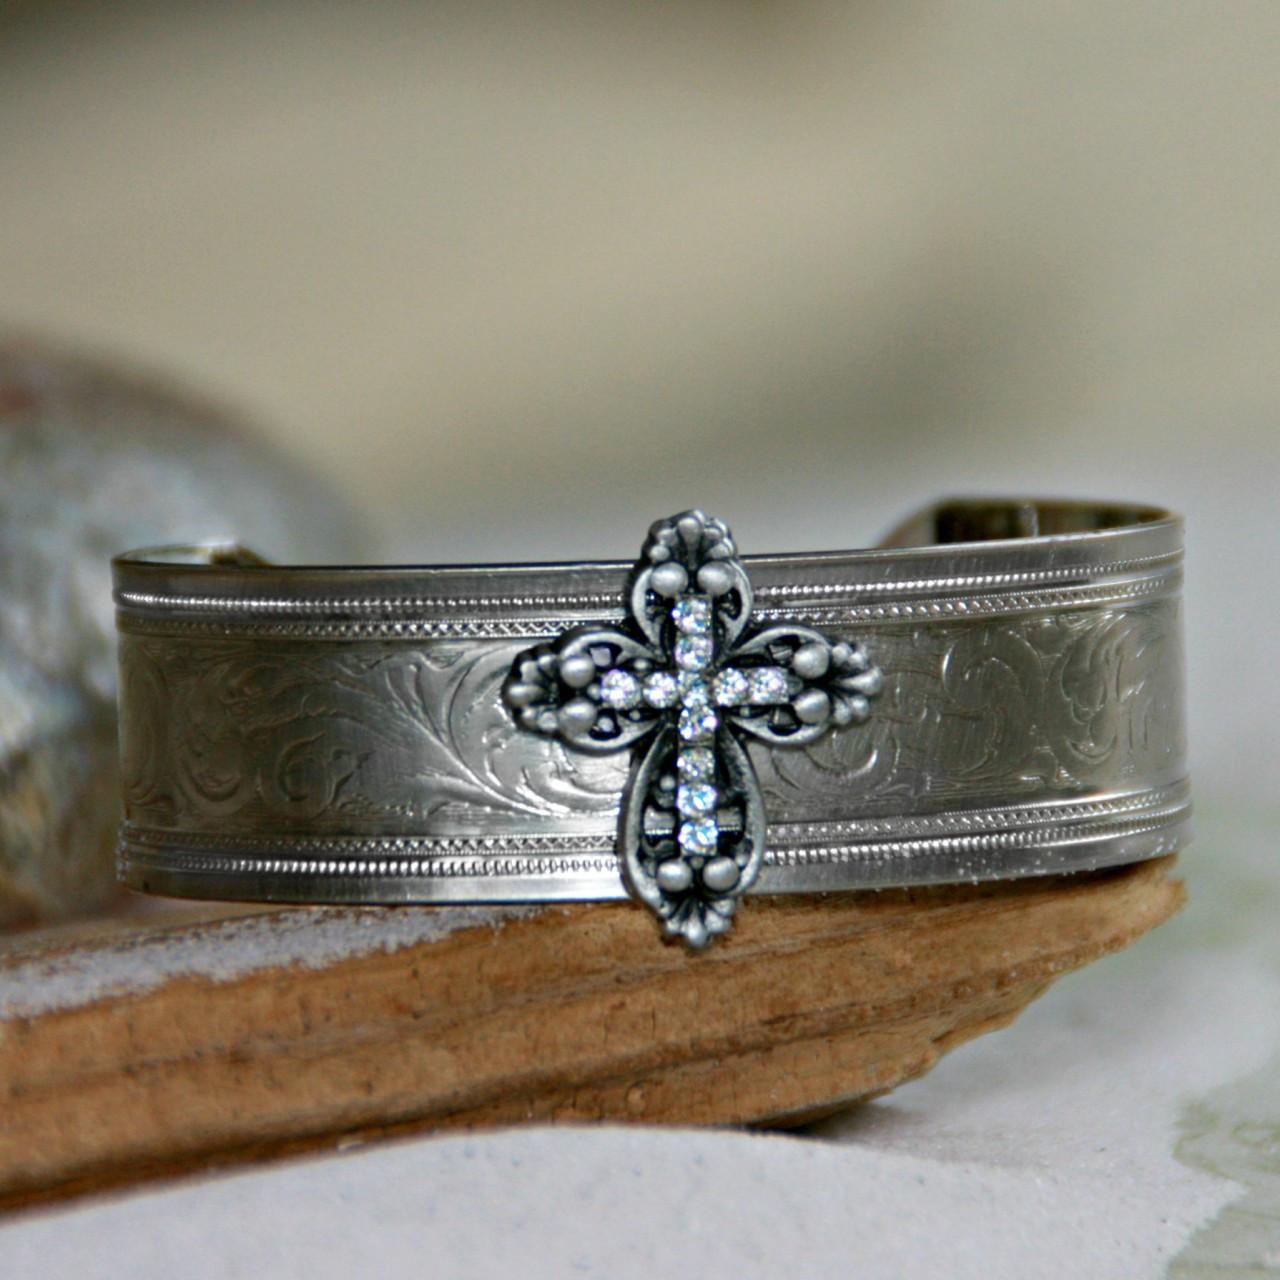 ART-132 Cross with Swarovski Crystals Cuff Bracelet